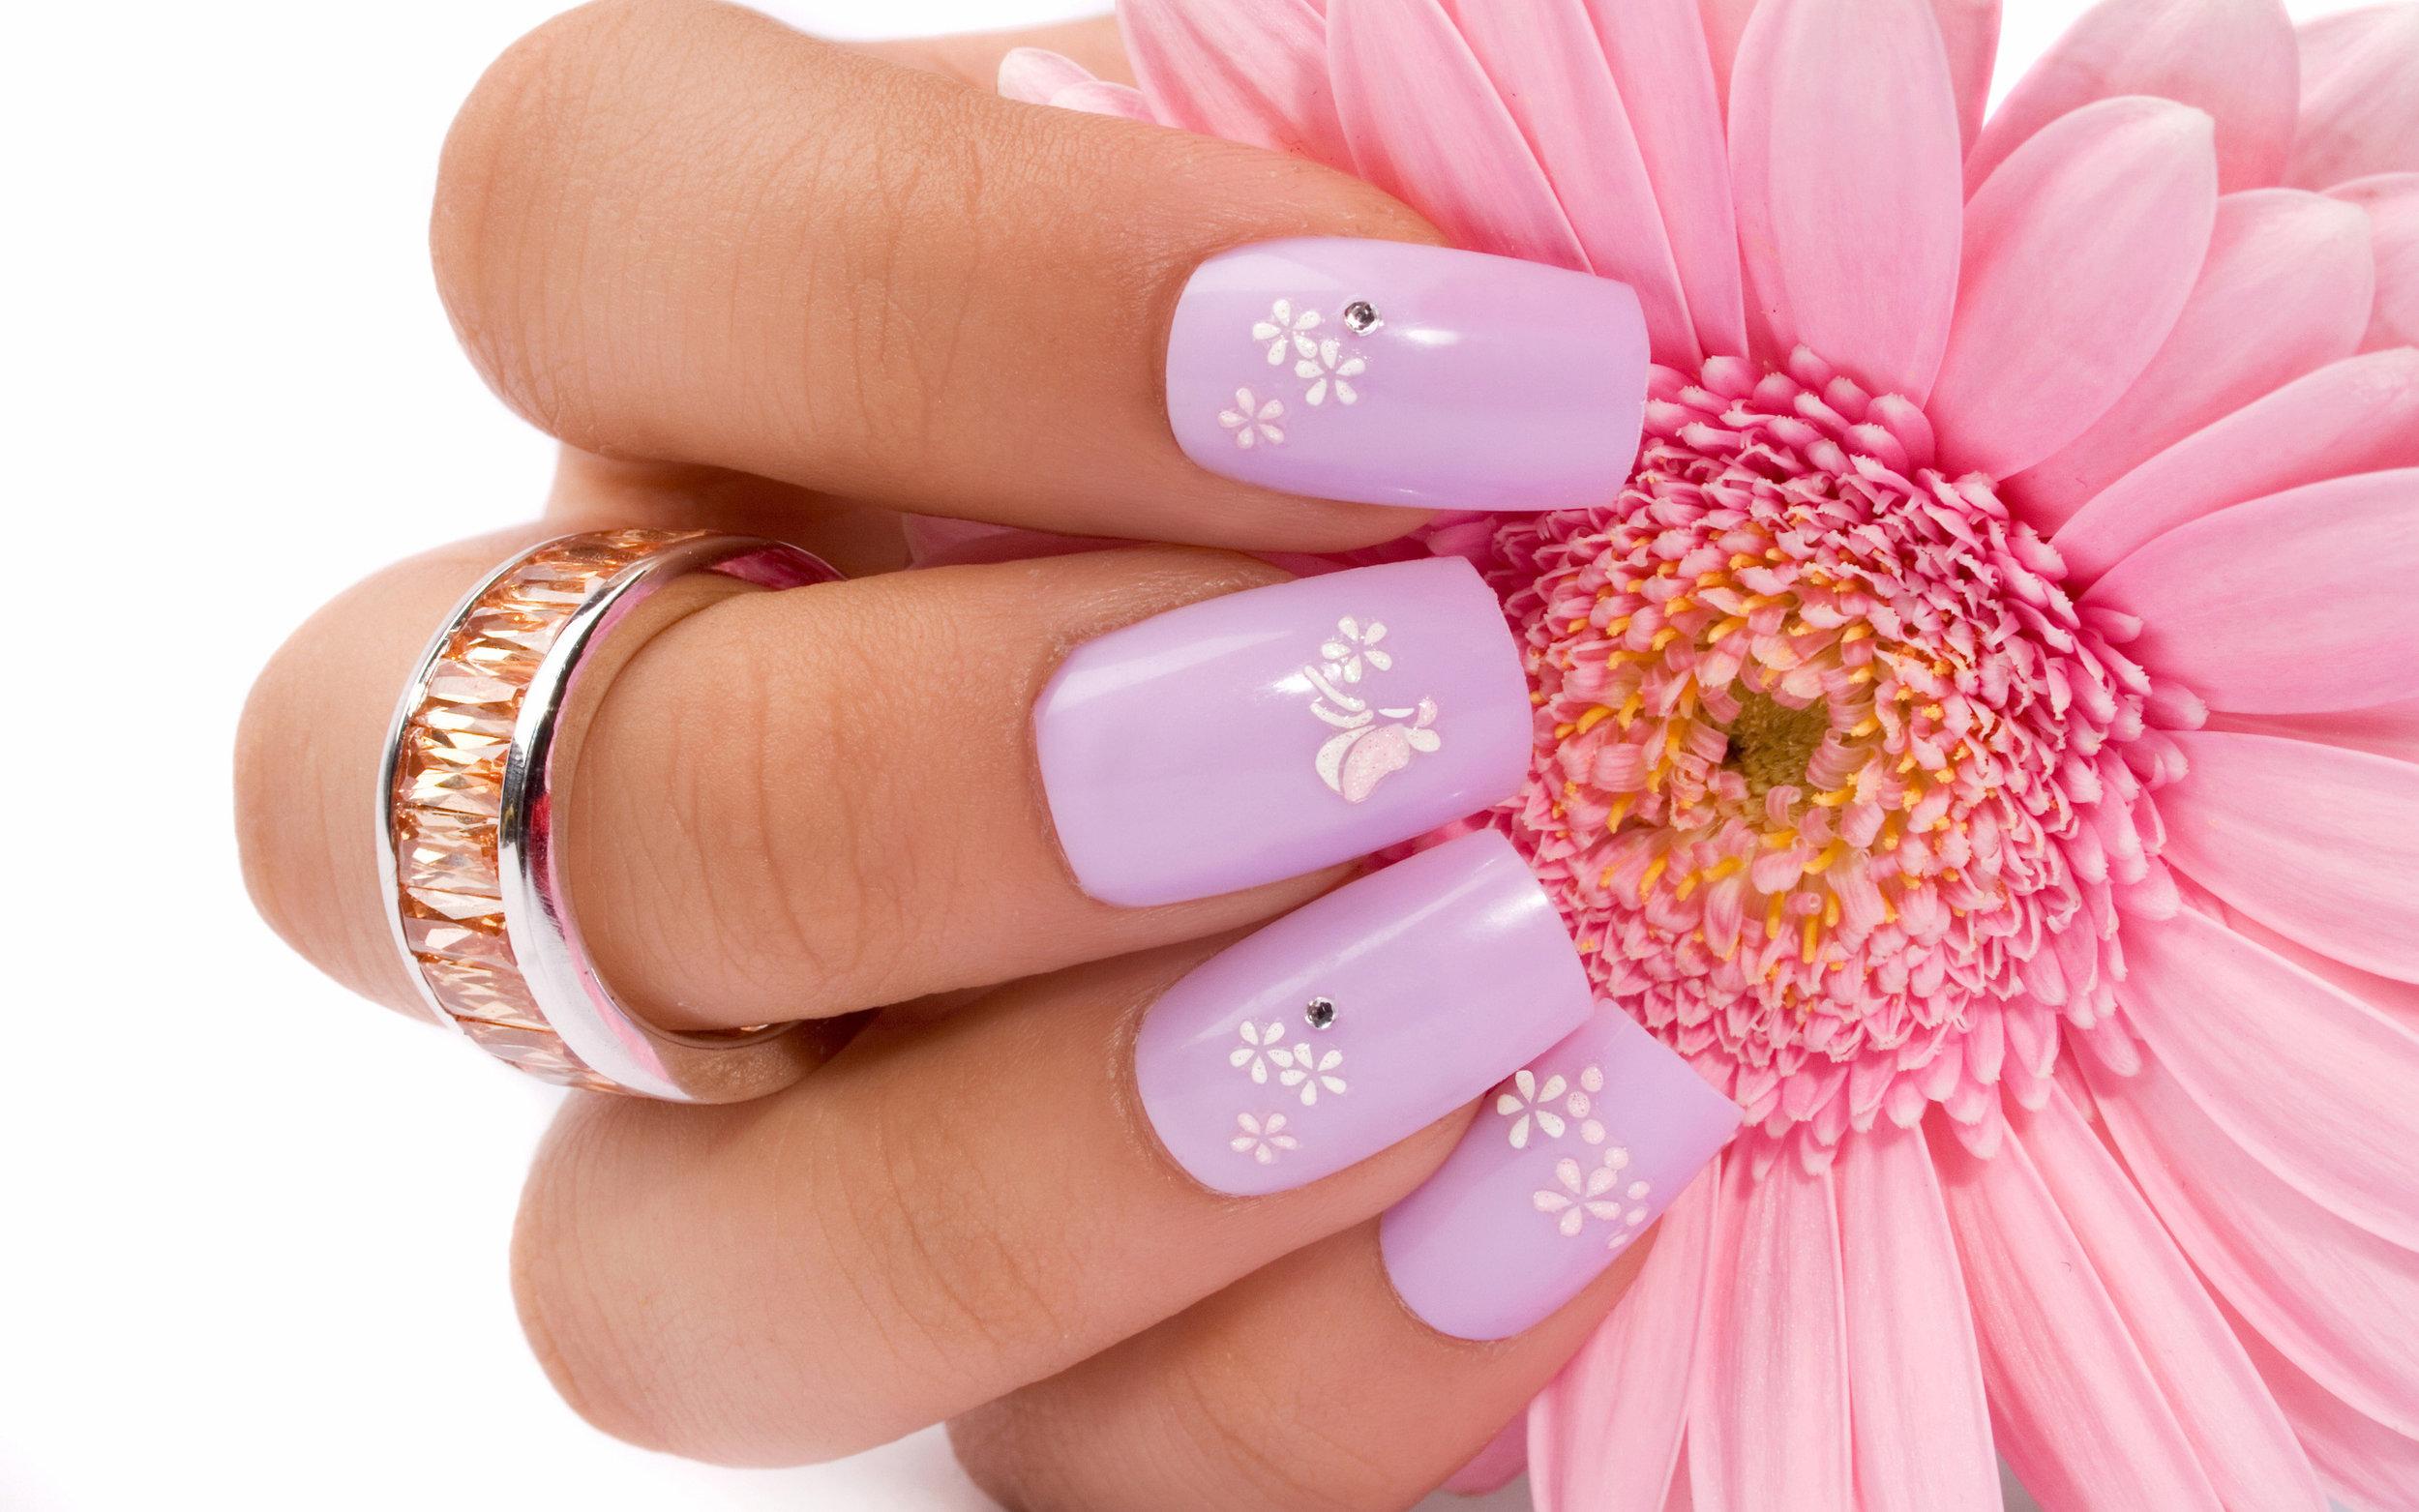 manicure-large-images.jpg